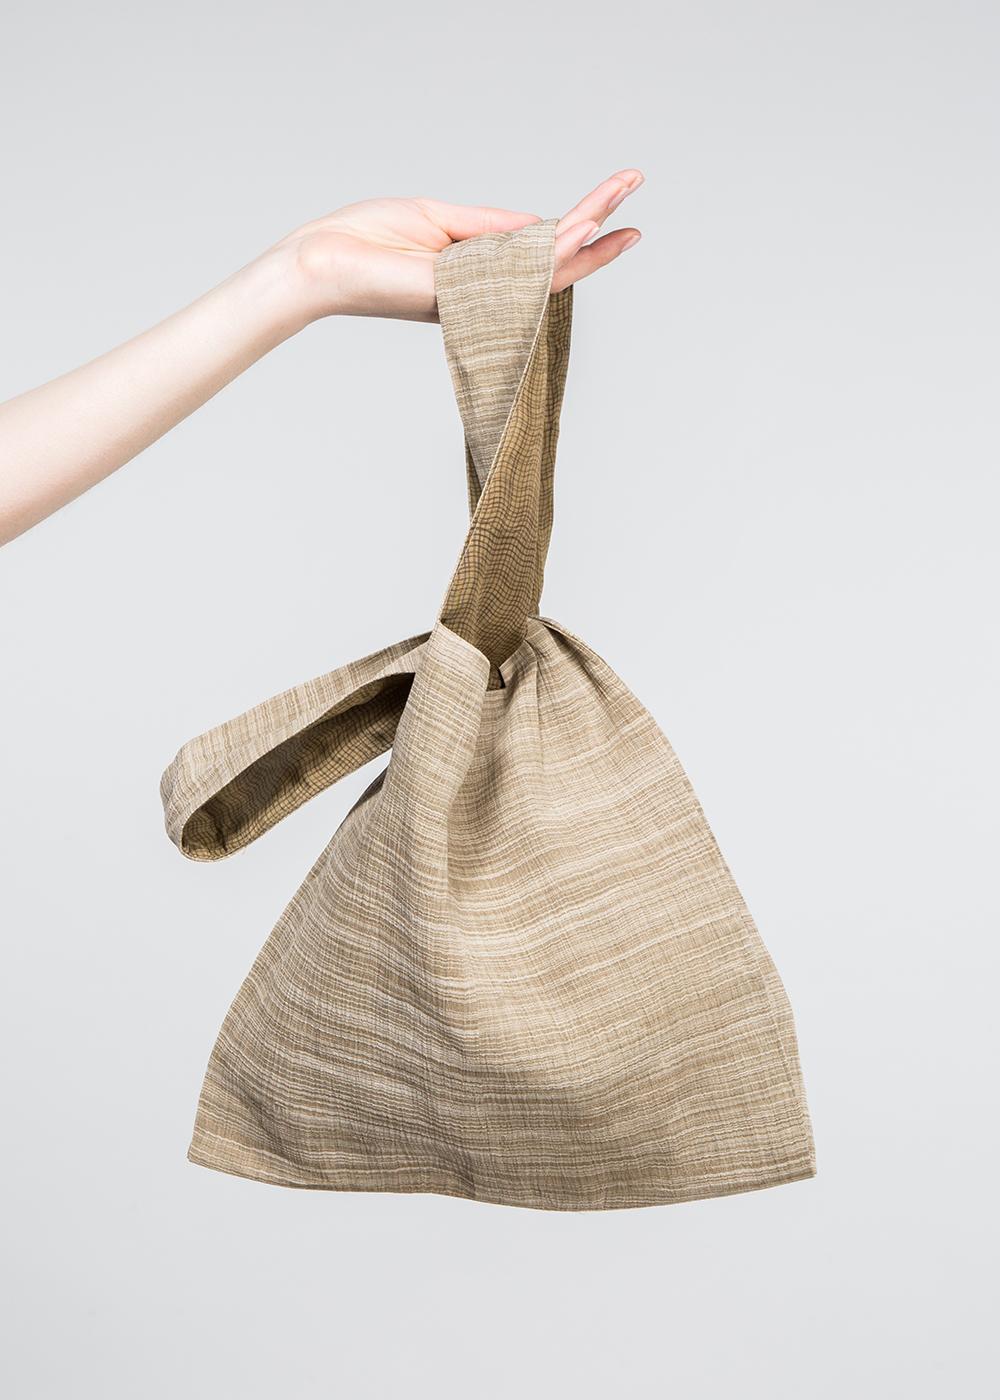 Hobo Bag in Vintage Japanese Tan Linen  $225